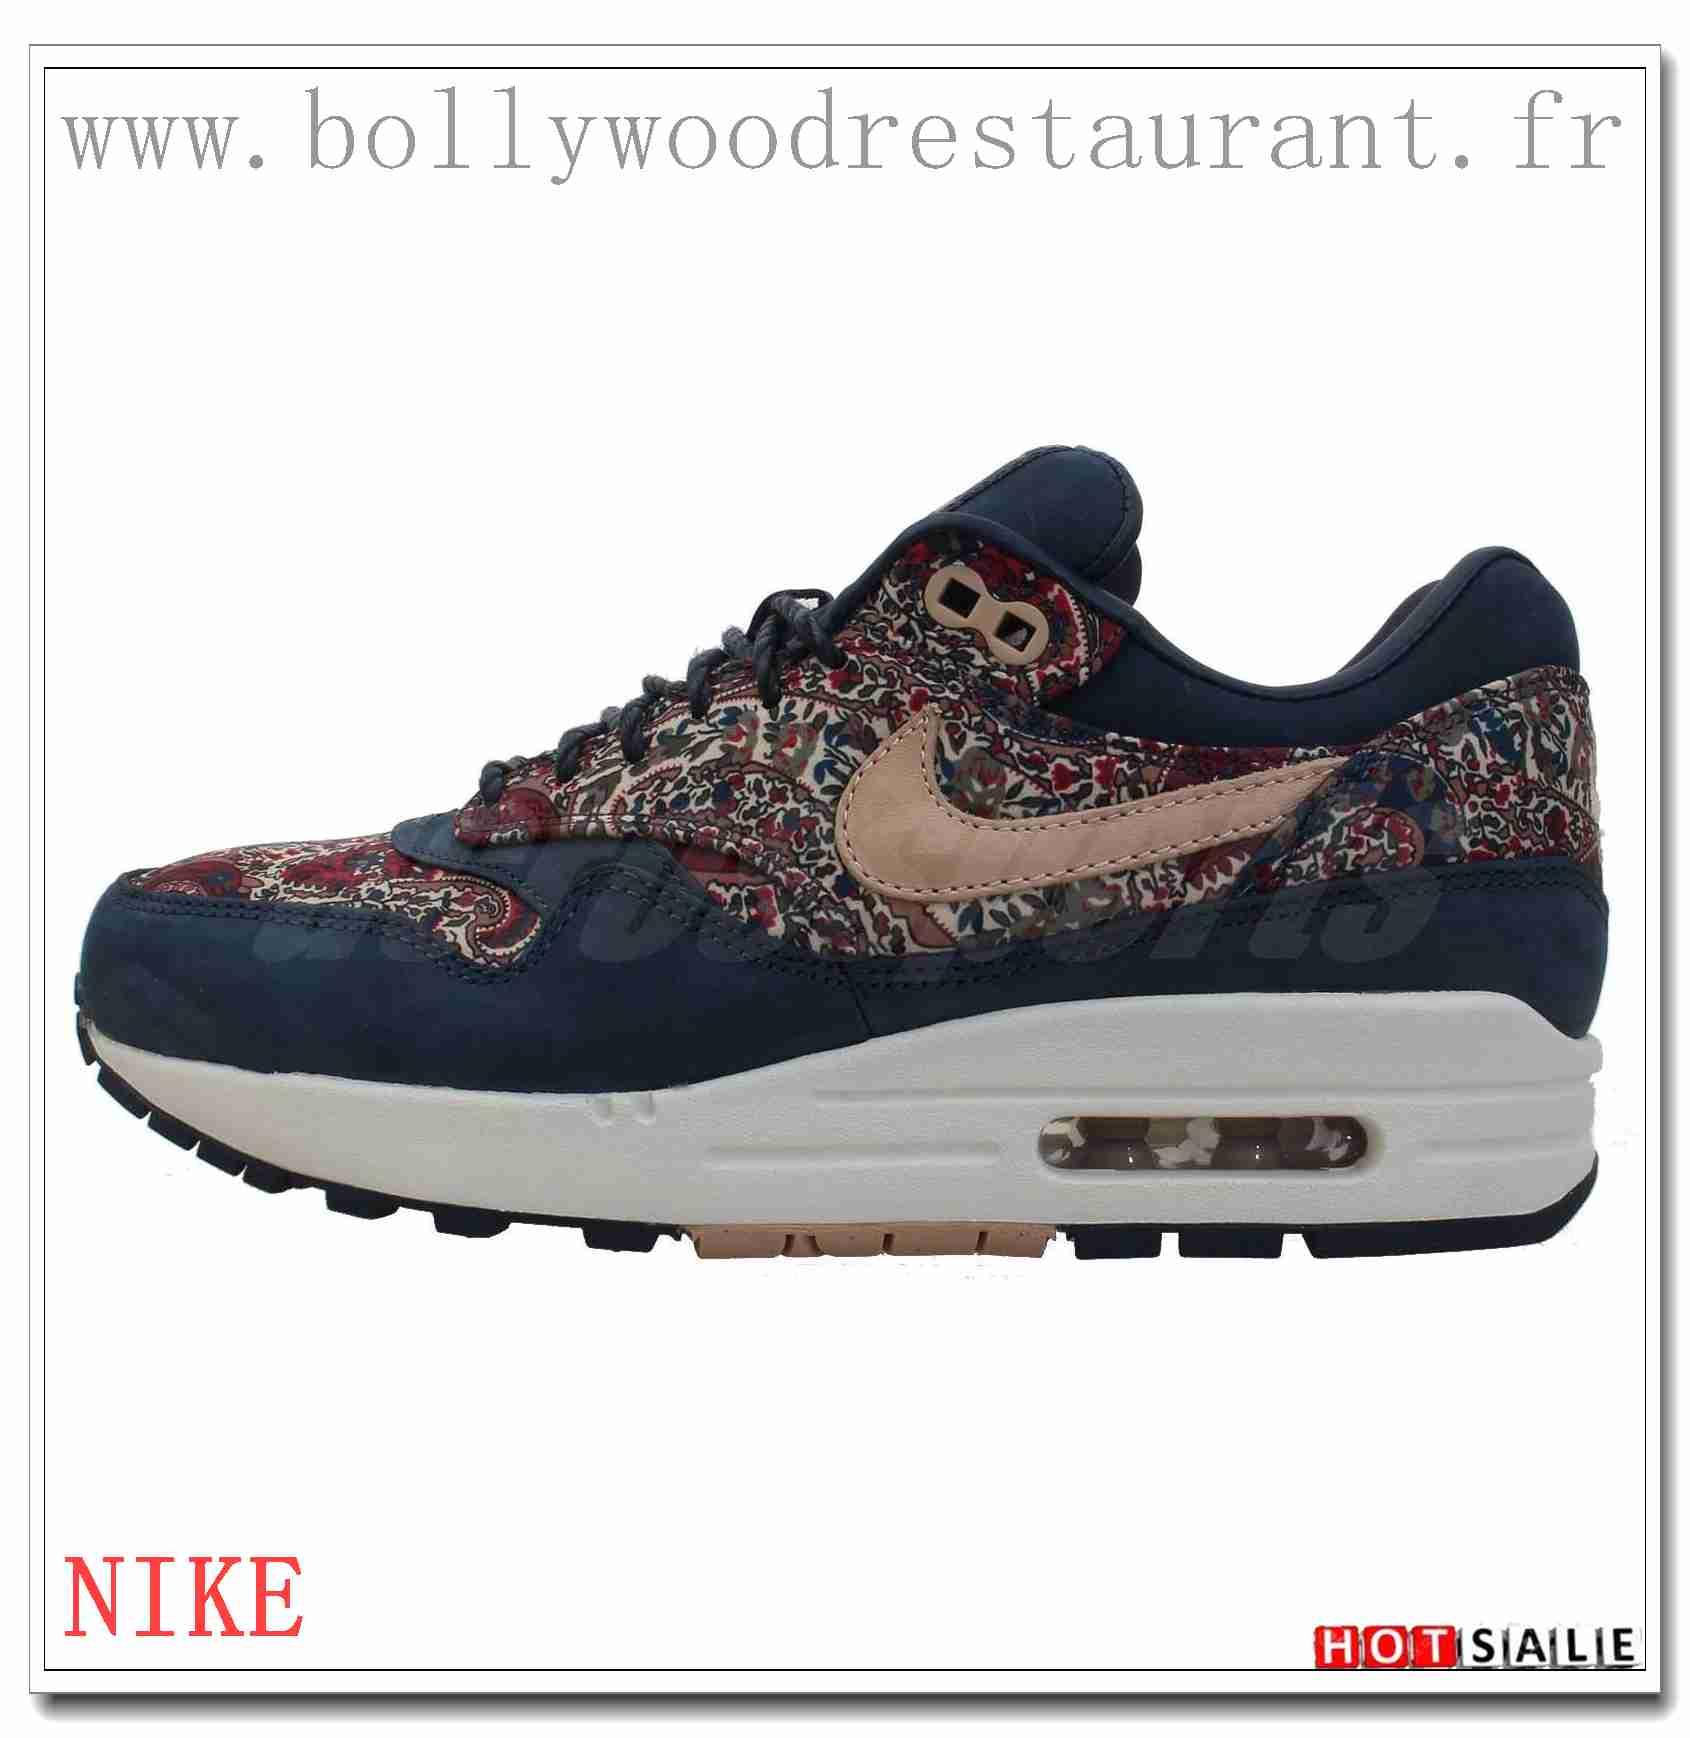 detailed pictures 659a2 ca41c ZE9125 Achat Pas Cher Mondiaux 2018 Nouveau style Nike Air Max 1 - Femme  Chaussures - Promotions Vente - H.K.Y. 941 - Taille   36~39